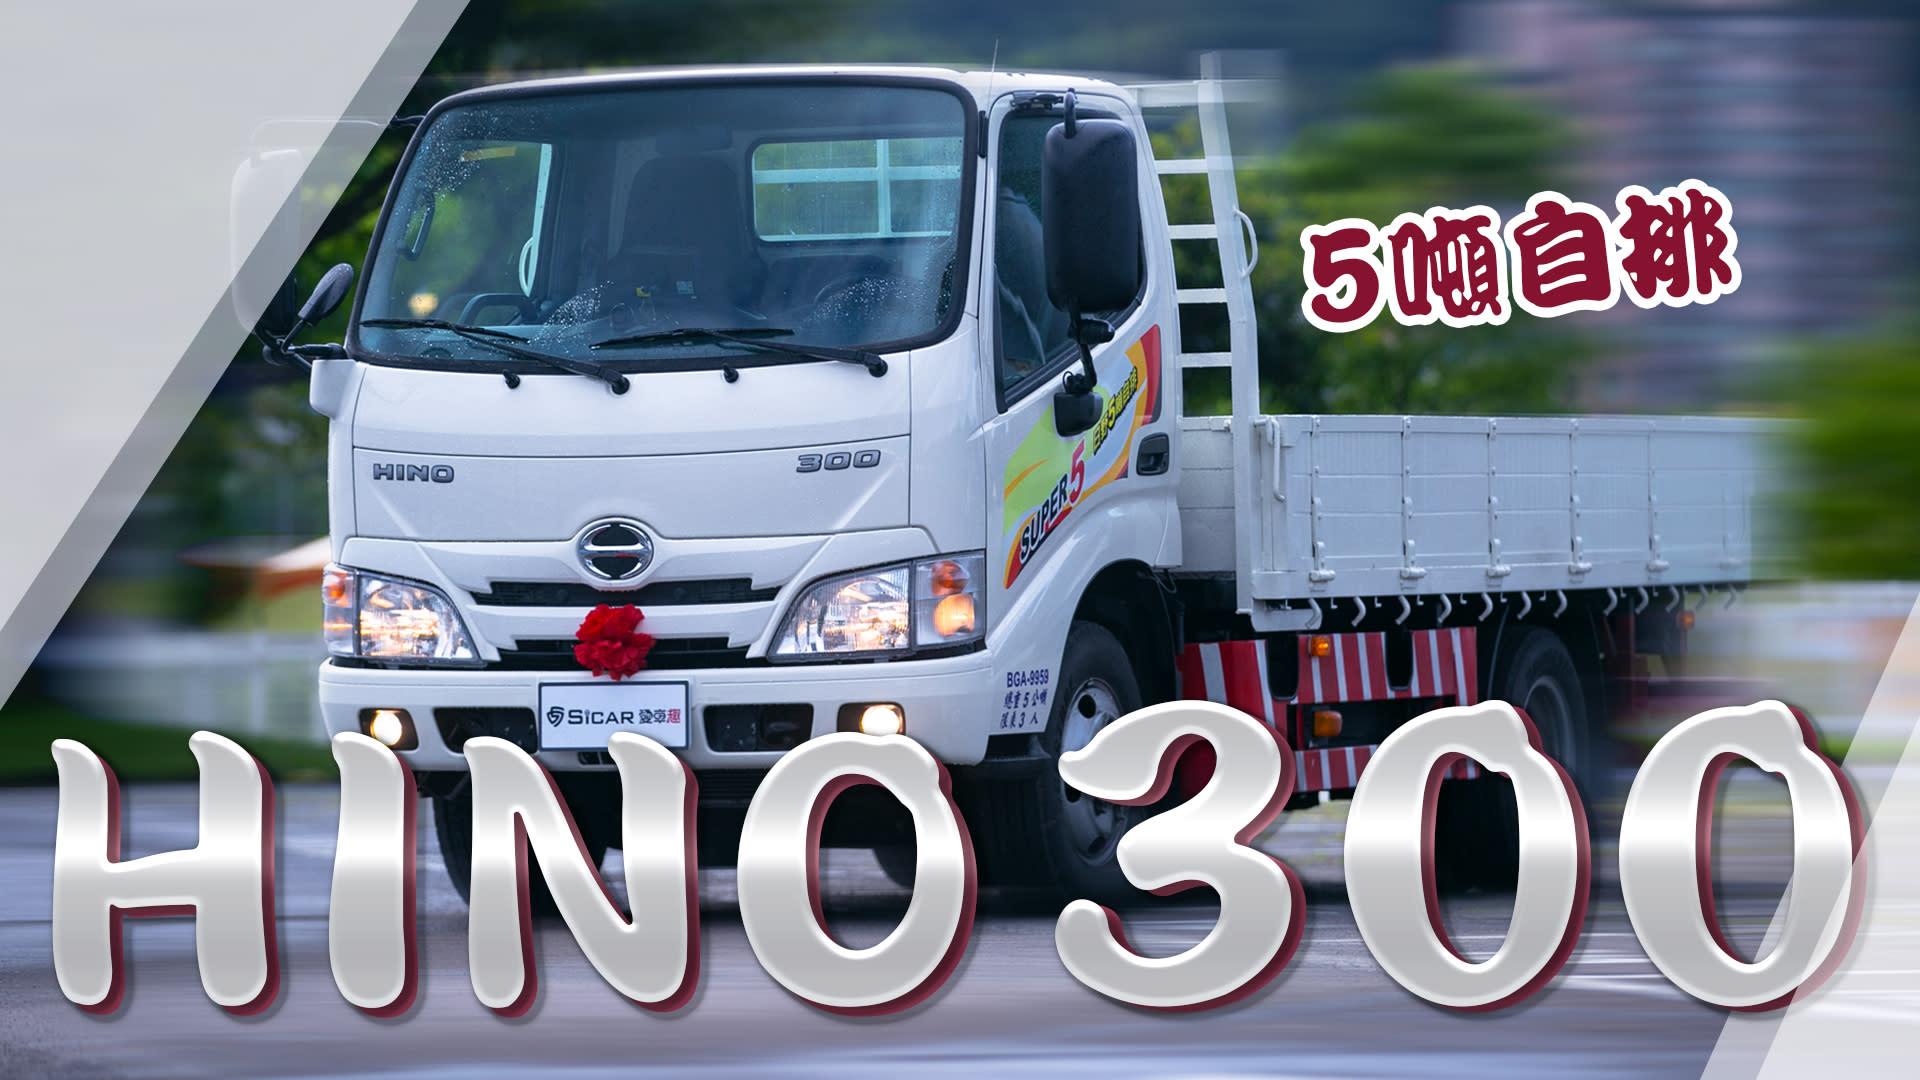 【Andy老爹試駕】全新HINO 300!小客車駕照就能開!人人都是老司機!!!